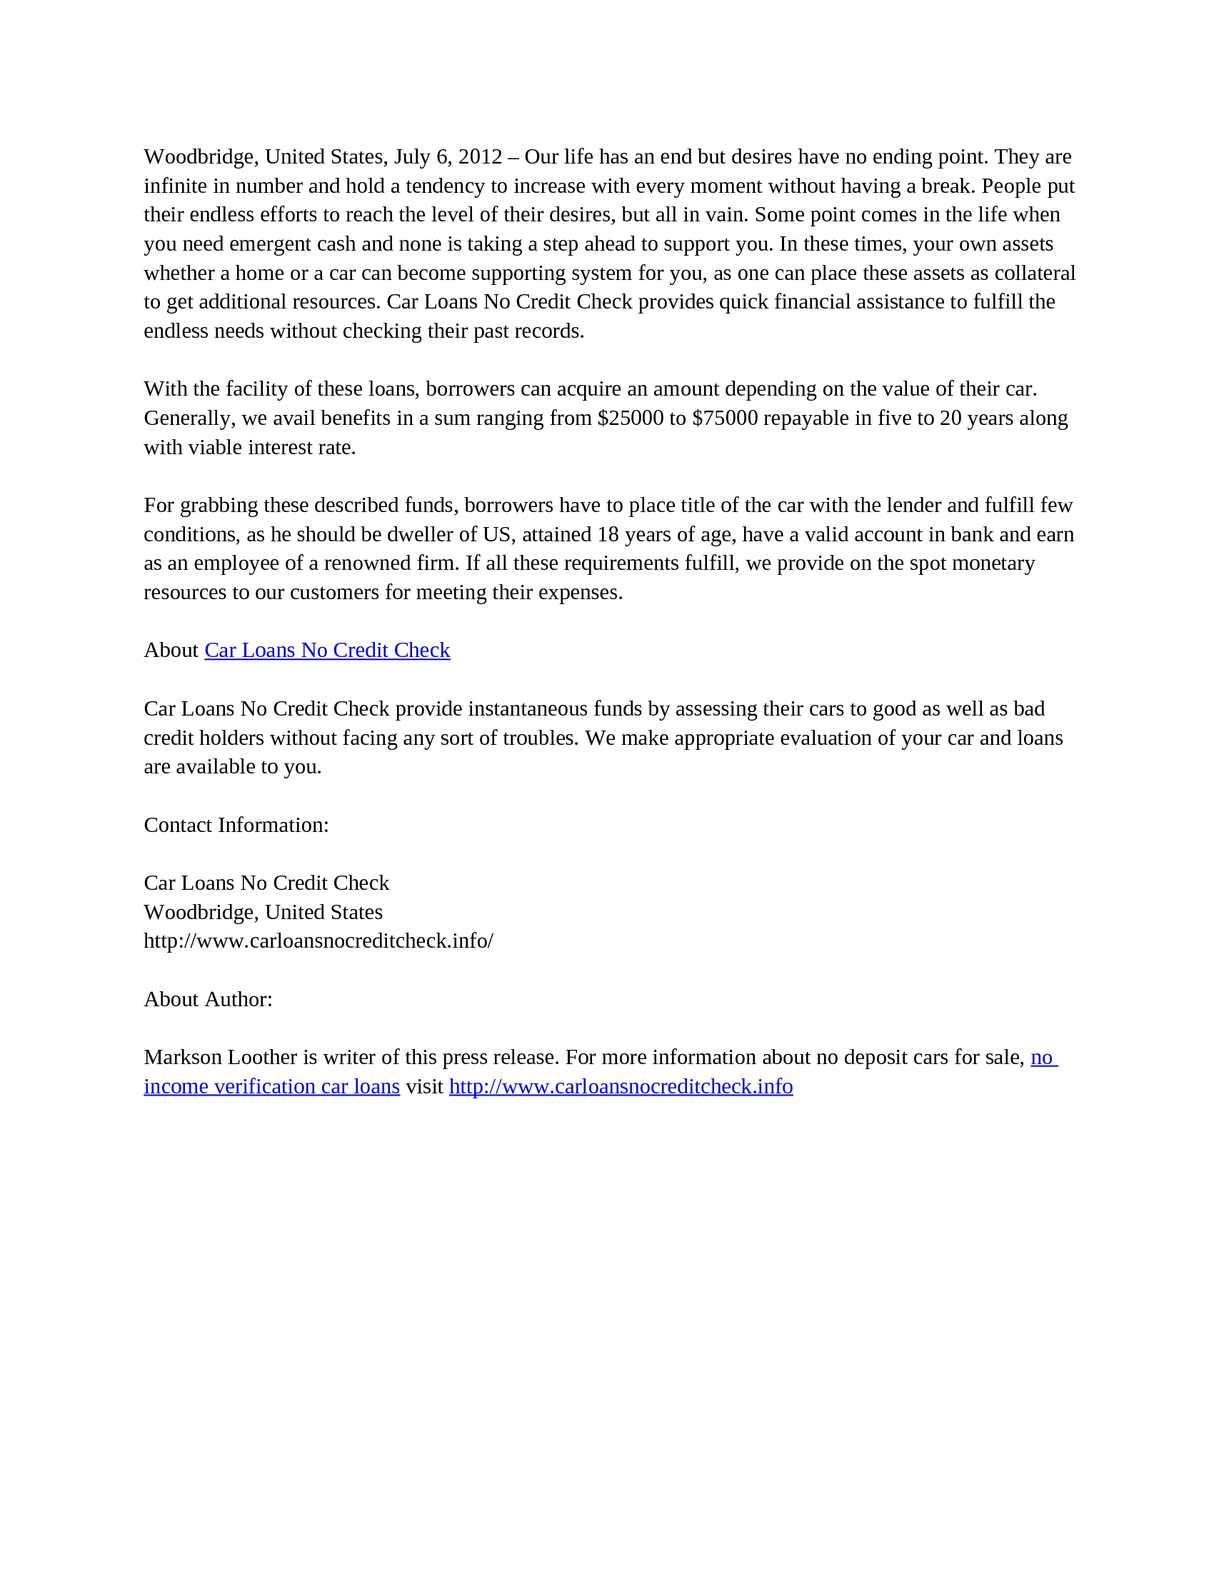 No Credit Check Car Loans >> Calameo Car Loans No Credit Check Secure Economic Funds